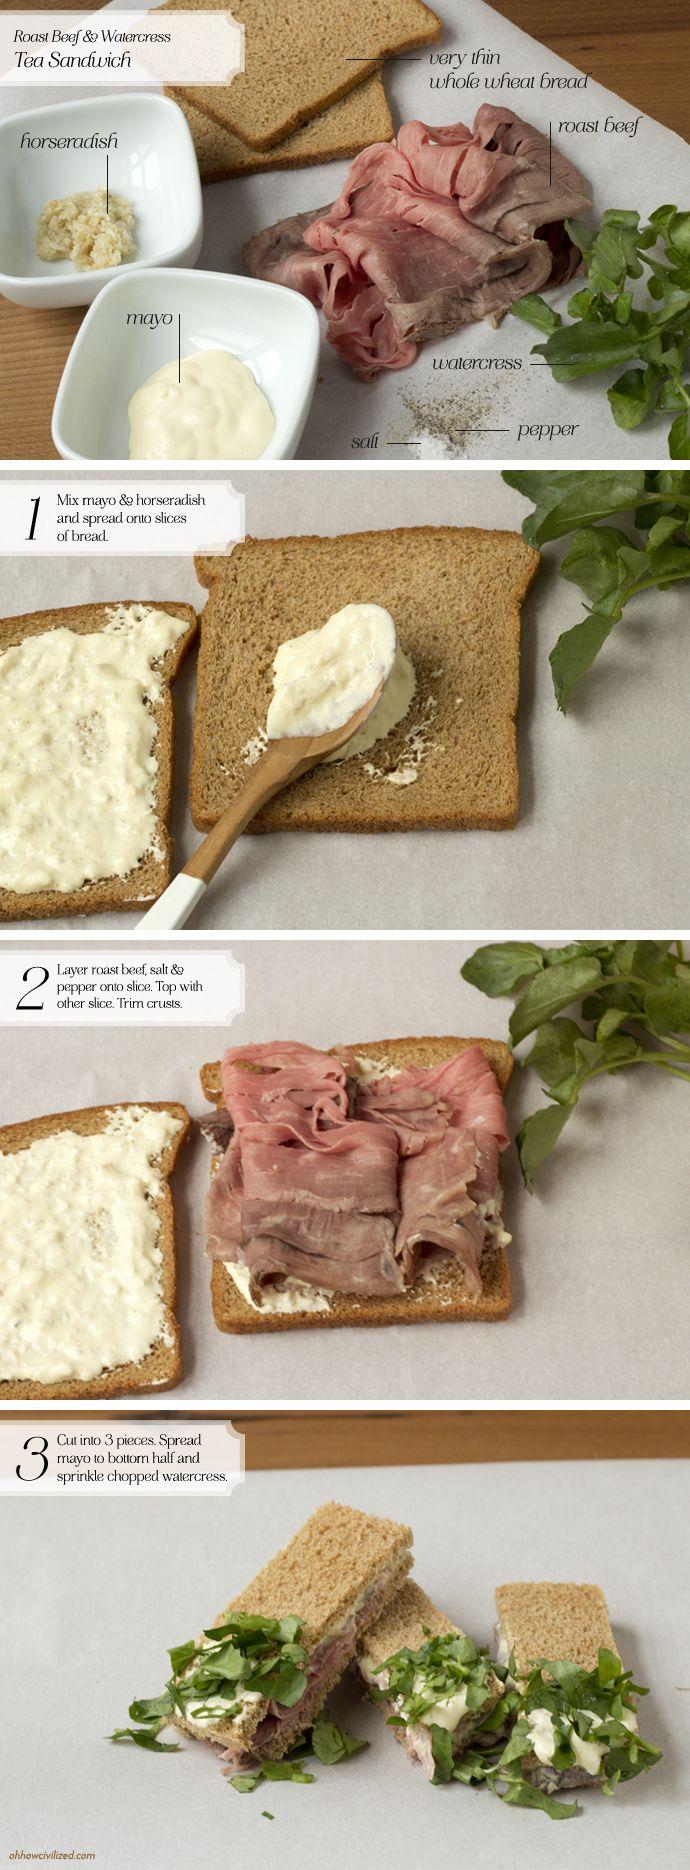 Tea Sandwich: Roast Beef & Watercress - Oh, How Civilized